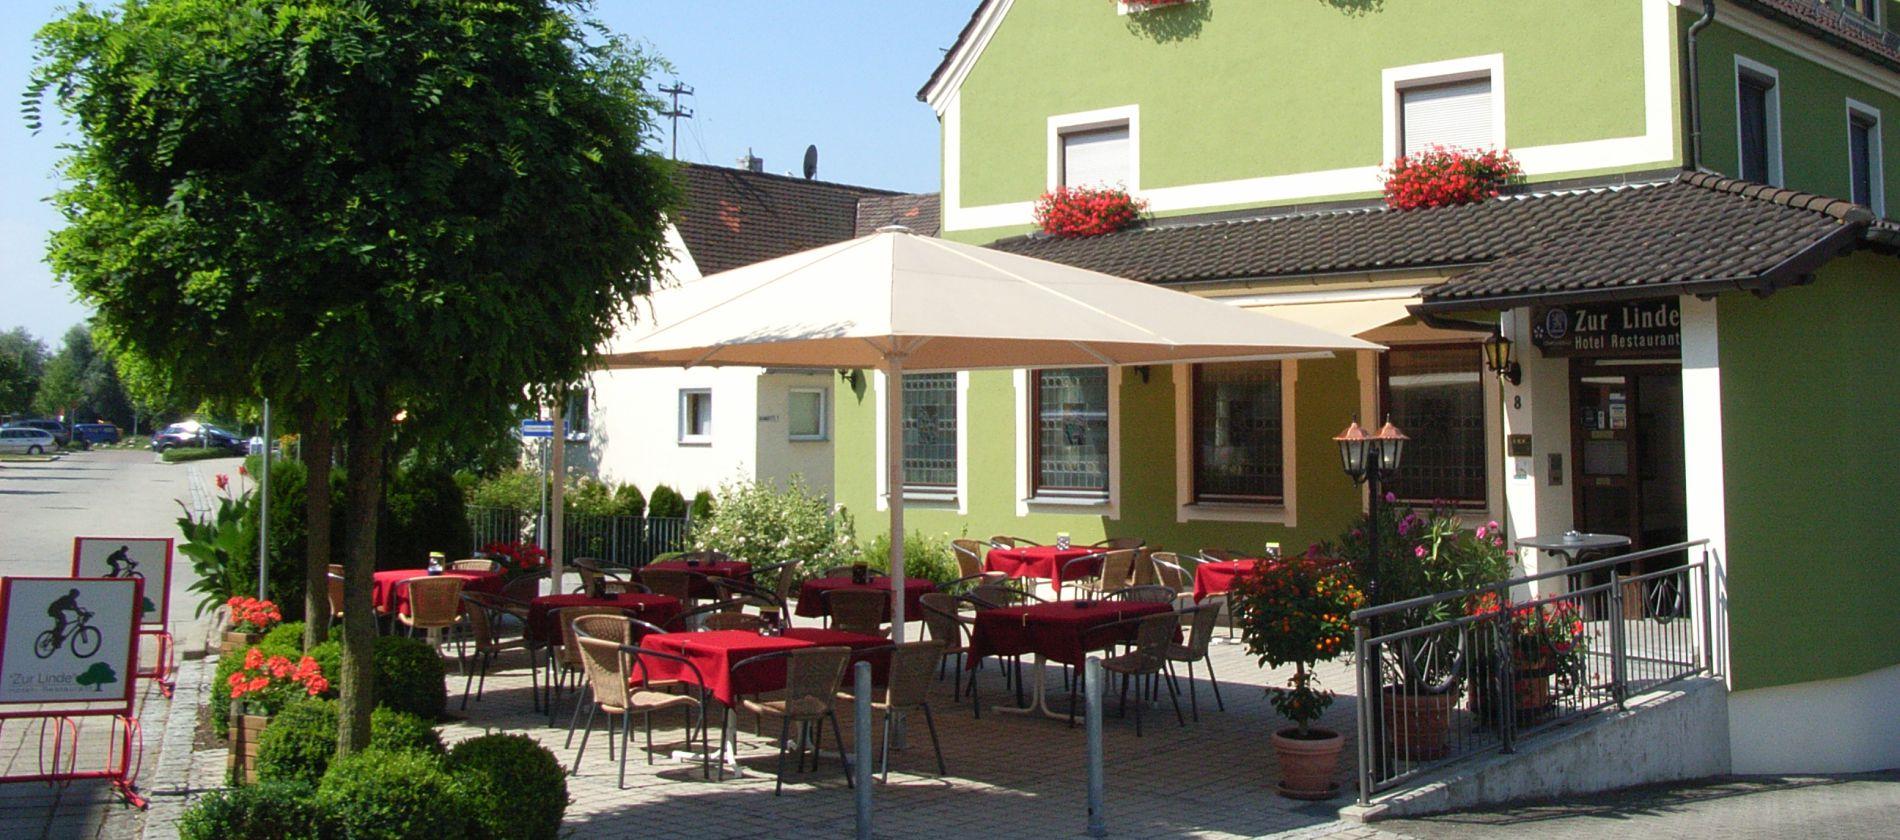 Home - Hotel-Restaurant \